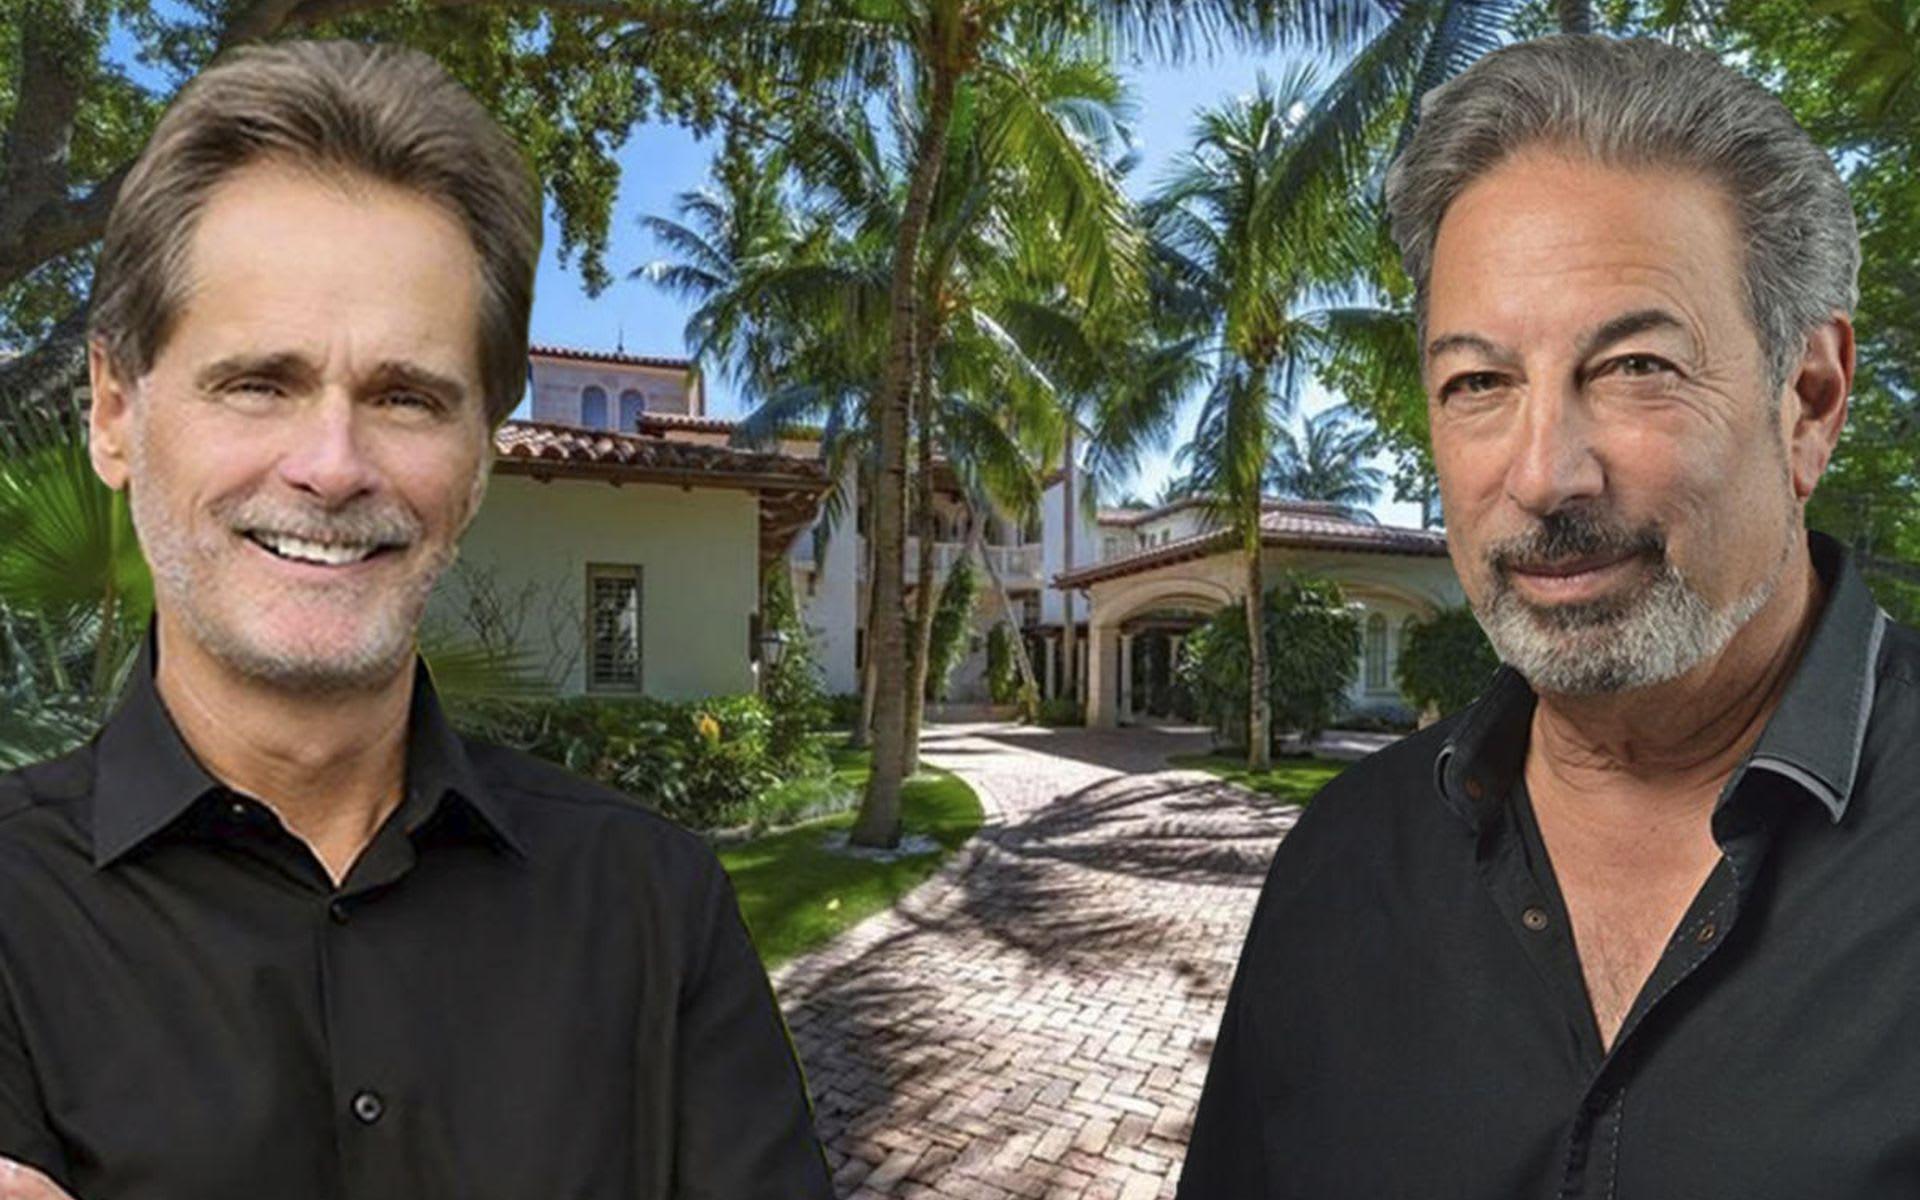 Pharmaceutical mogul sells Fort Lauderdale estate for $21M